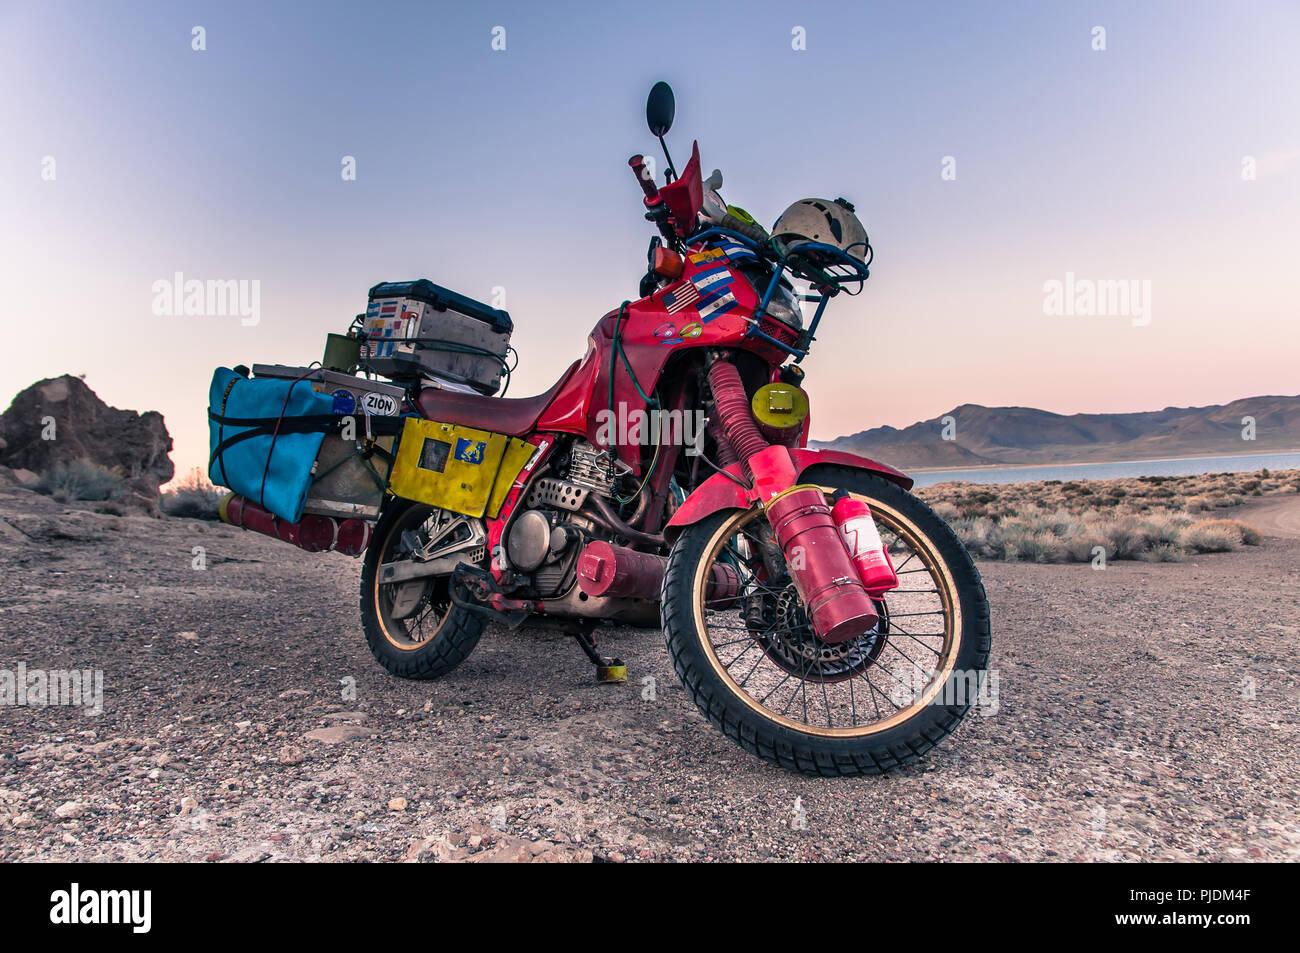 Touring bike parked by Pyramid Lake, Nevada, USA - Stock Image